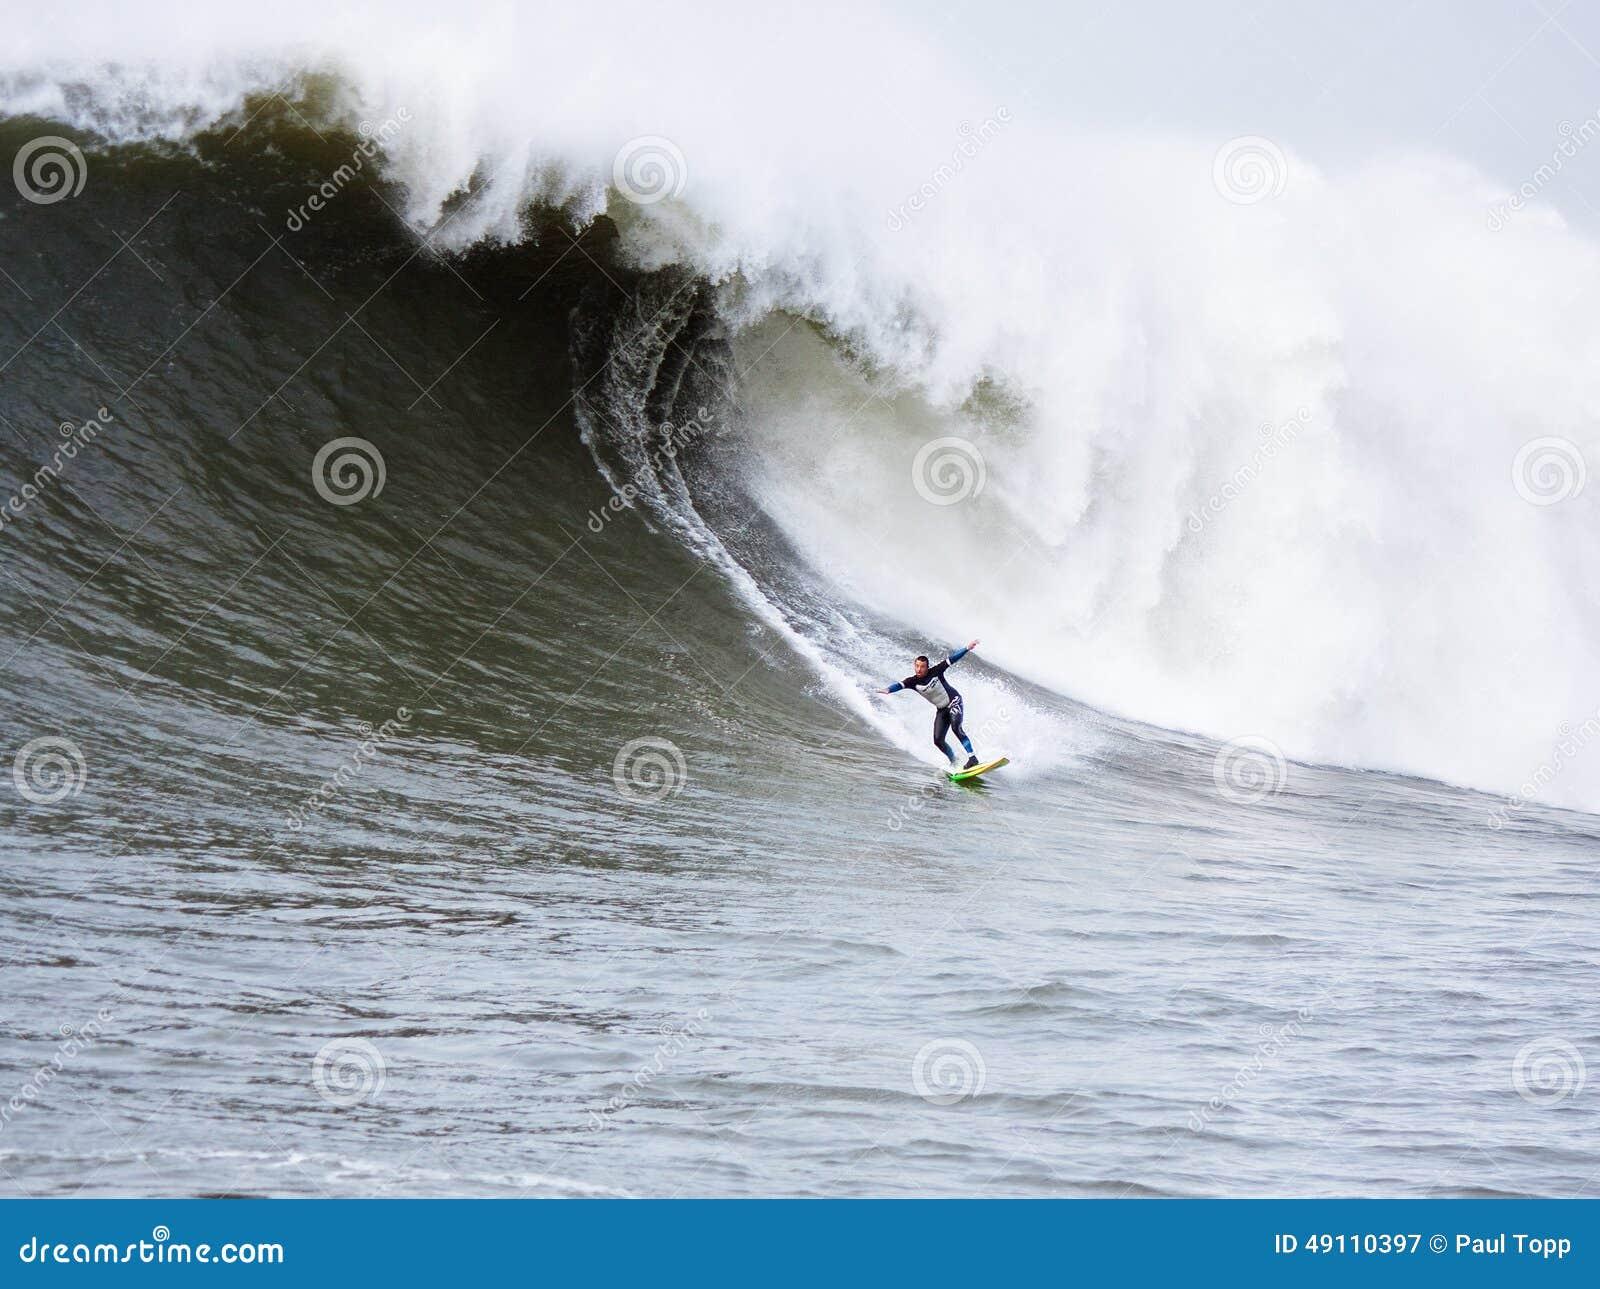 Grote Golfsurfer Anthony Tashnick Surfing Mavericks California